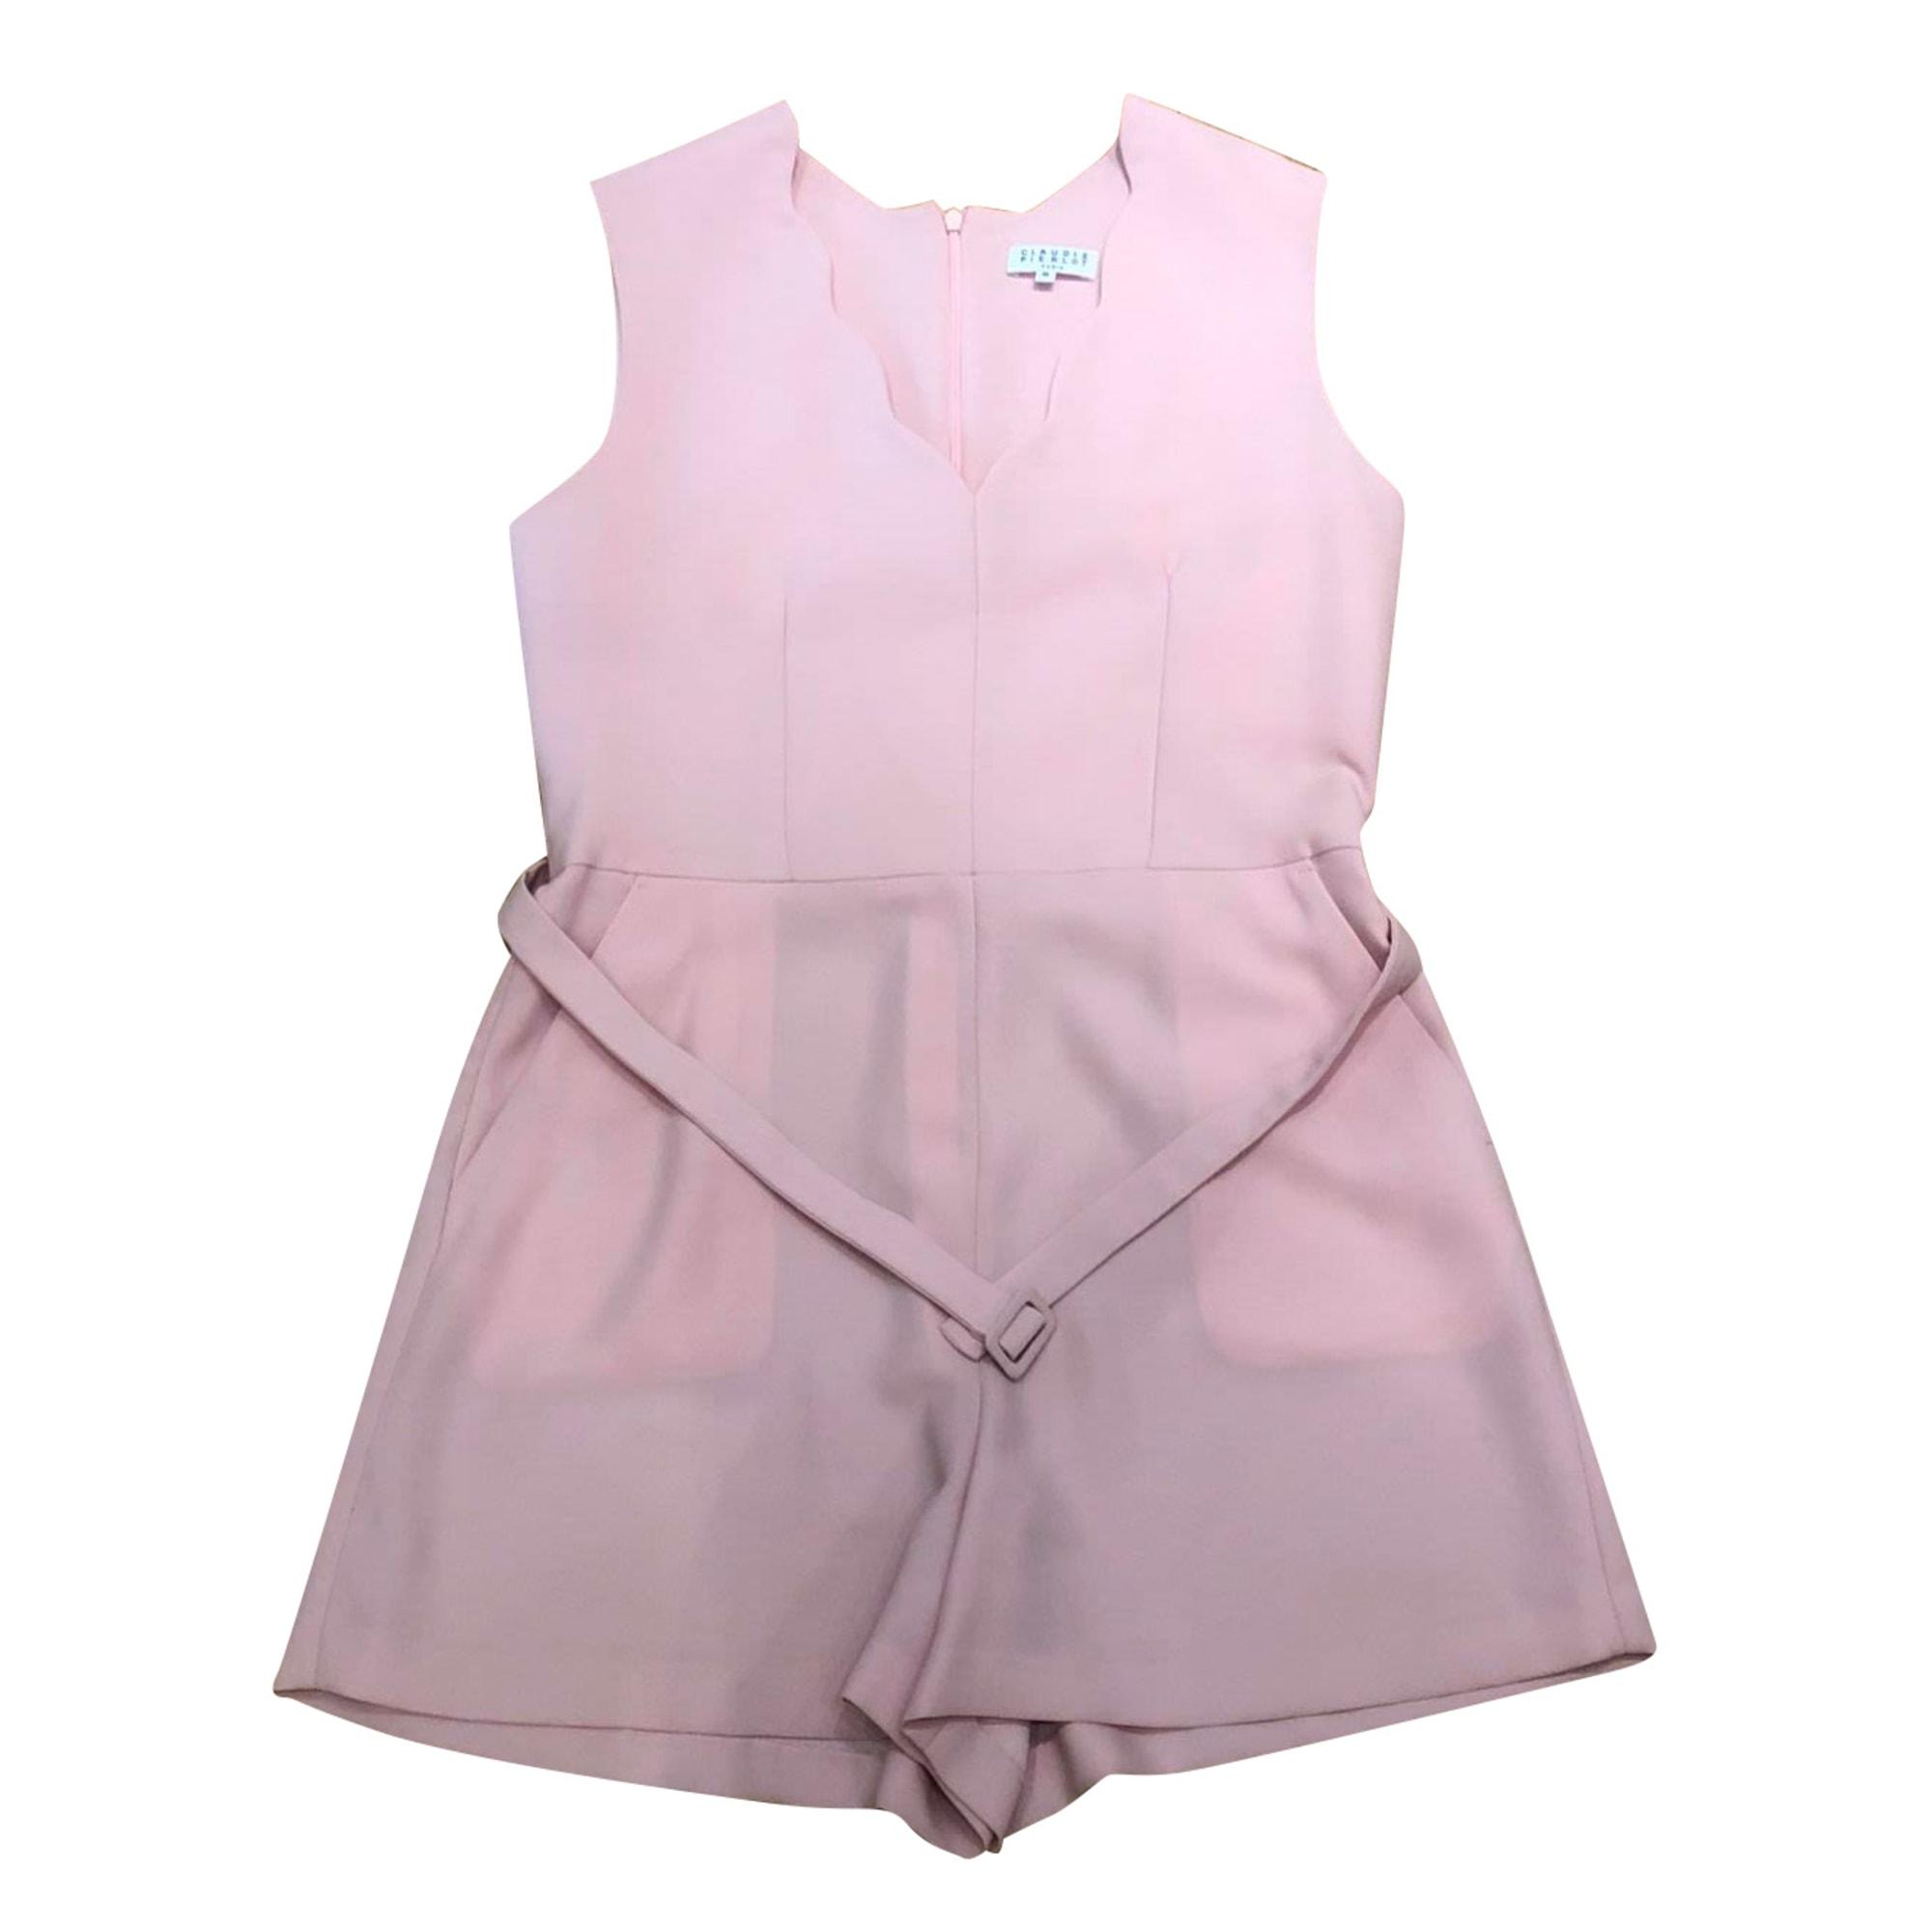 Playsuit CLAUDIE PIERLOT Pink, fuchsia, light pink